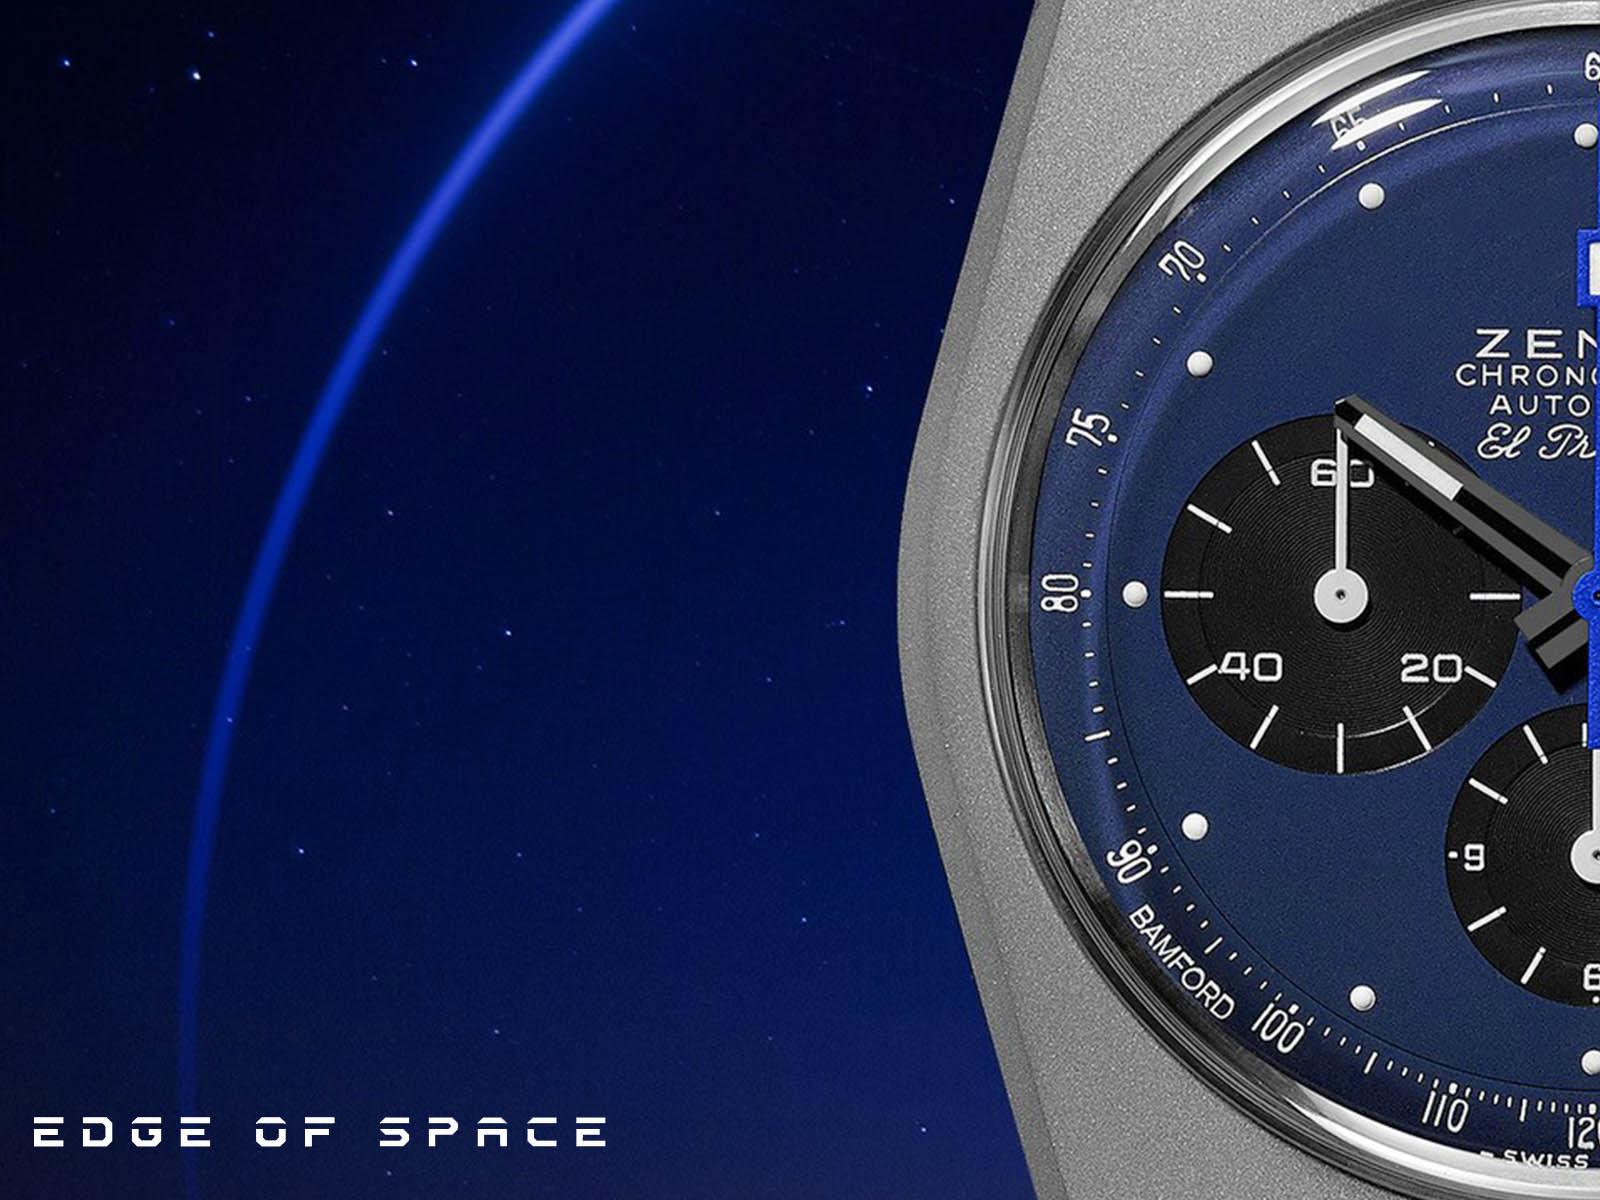 97-a384-400-27-c821-el-primero-revival-a384-edge-of-space-limited-edition-4.jpg